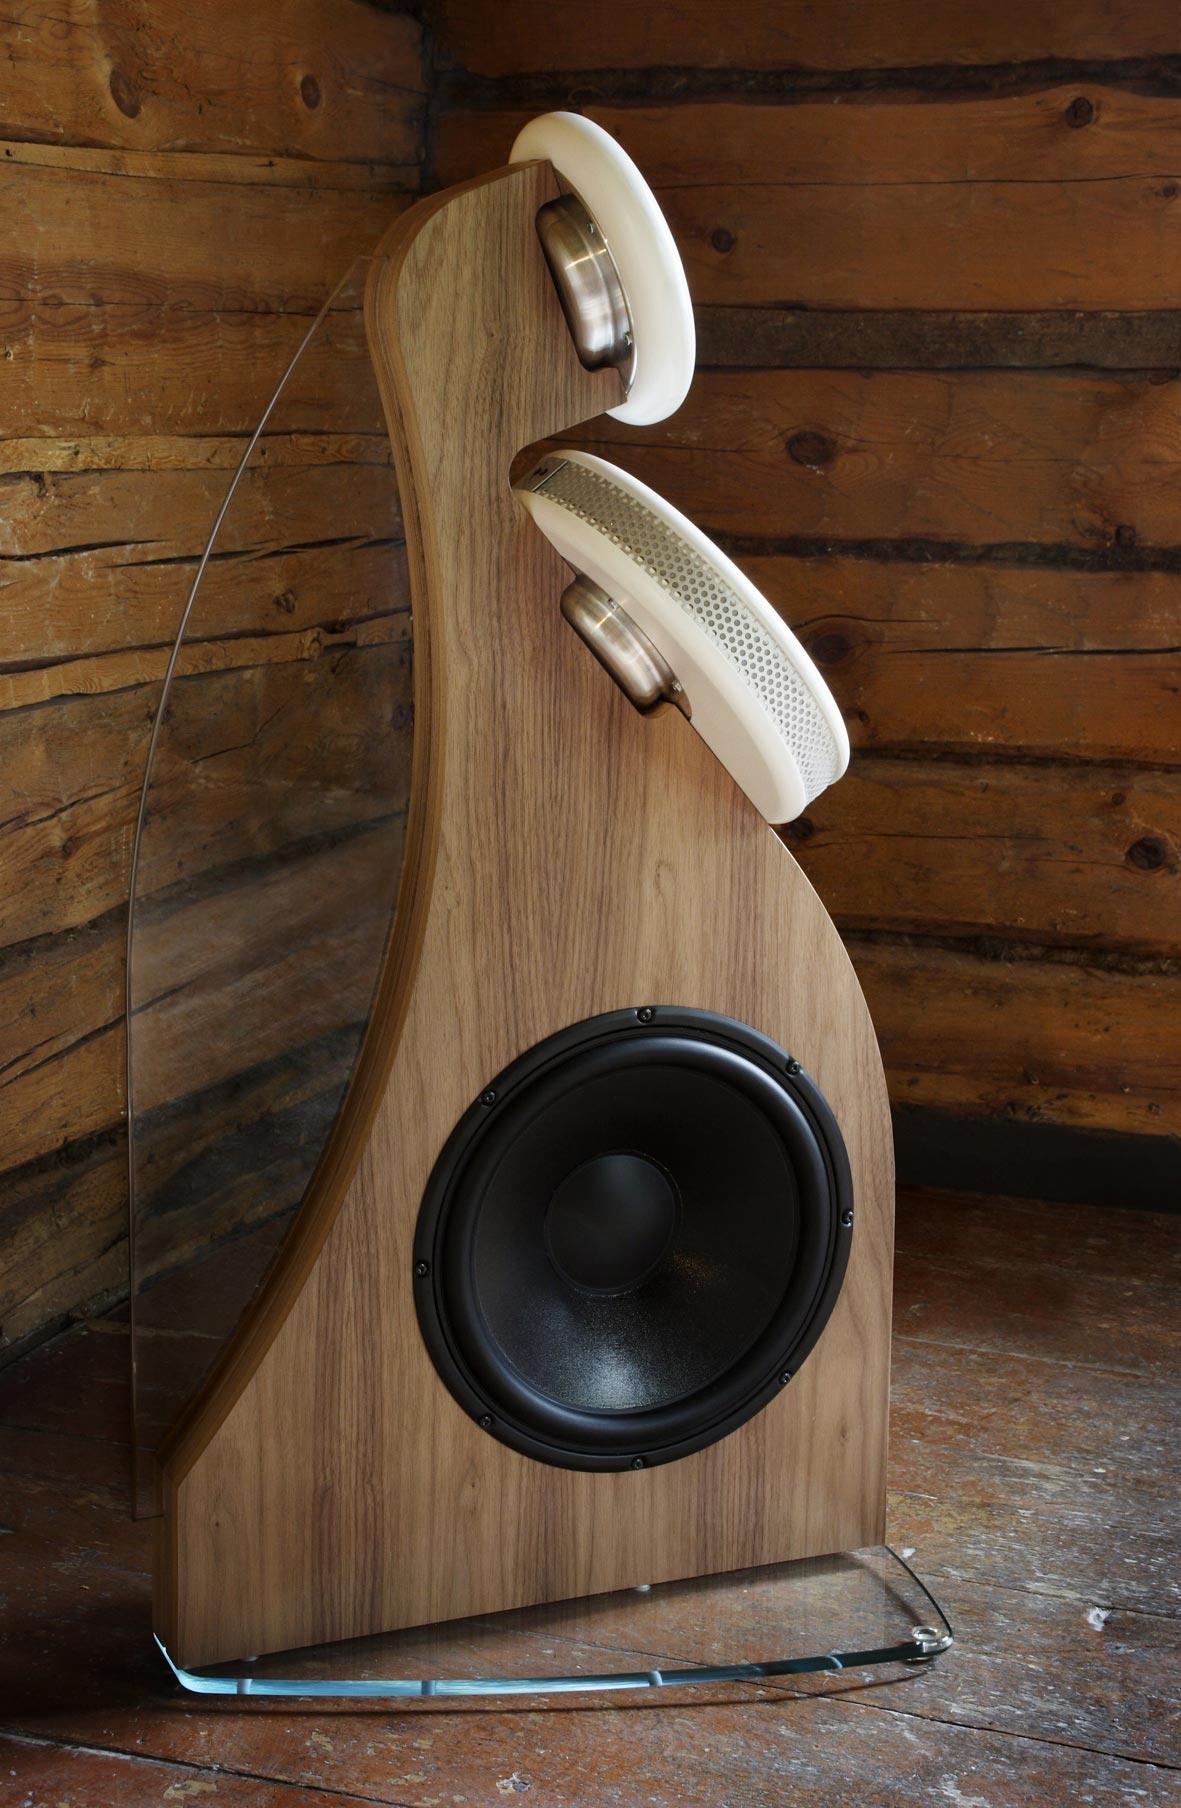 Helsinki 1 5 Speakers Take Speaker Design To A Different